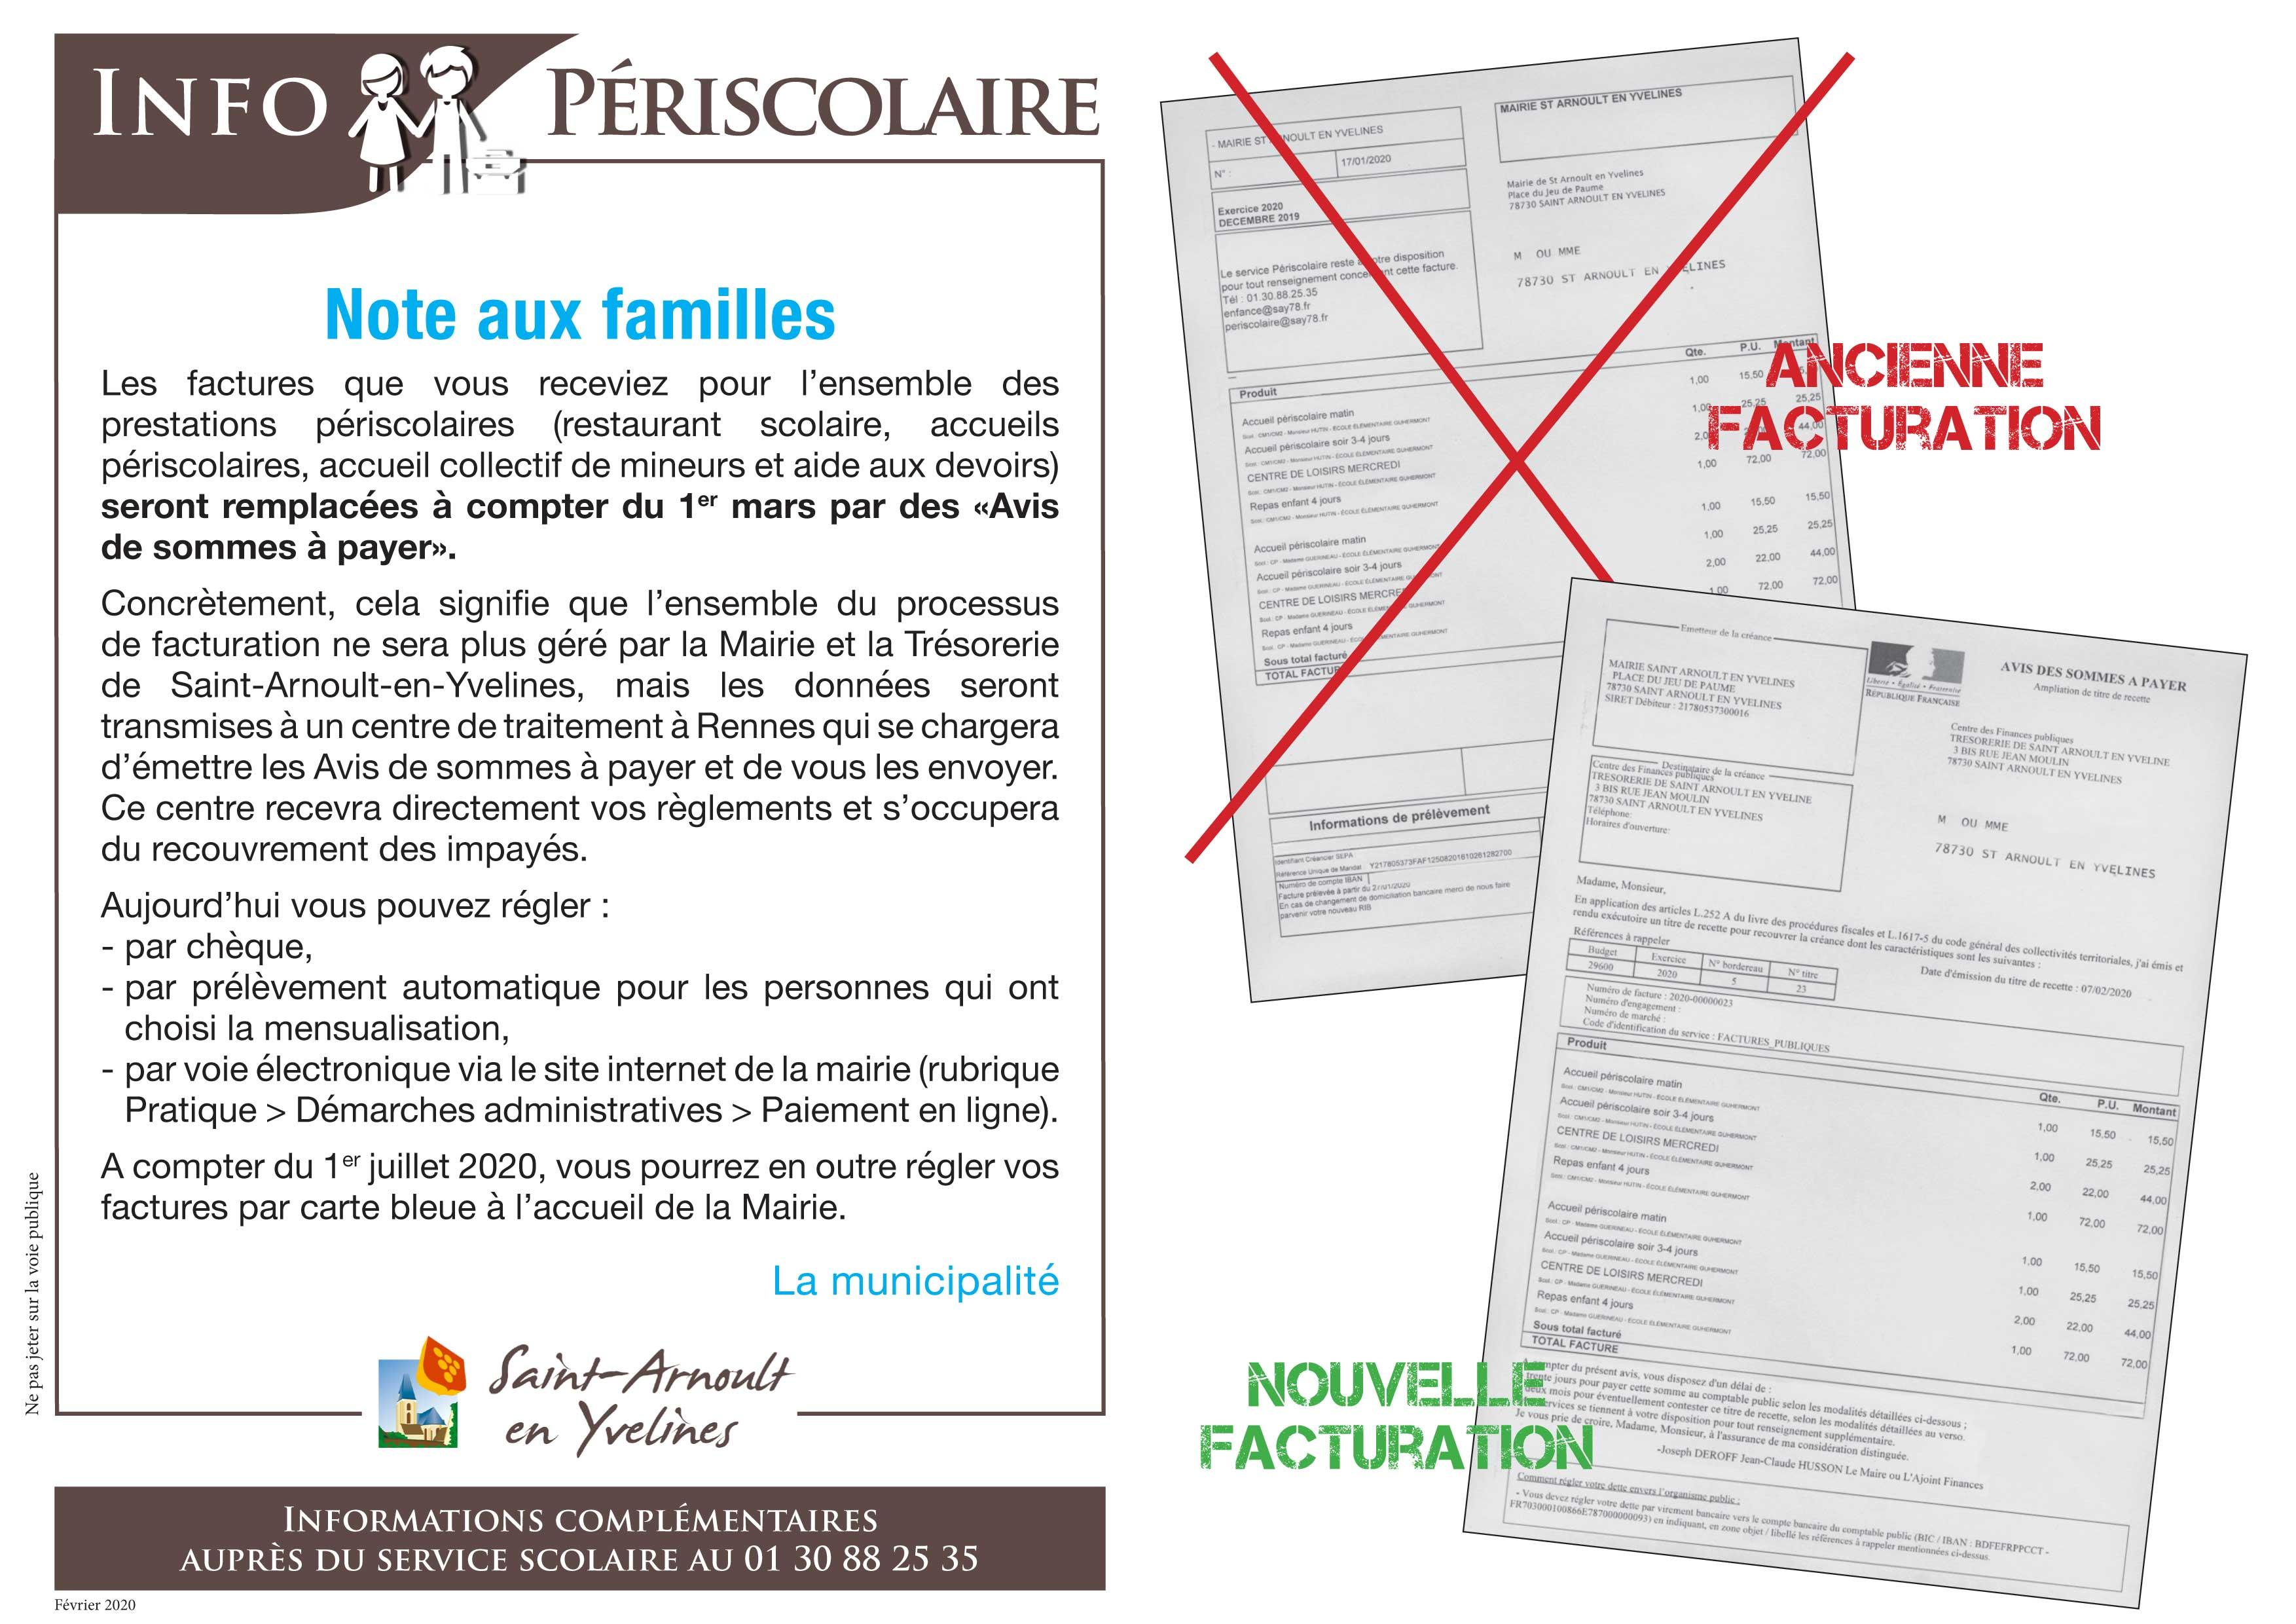 Info-Periscolaire-nouvelle-facturation.jpg